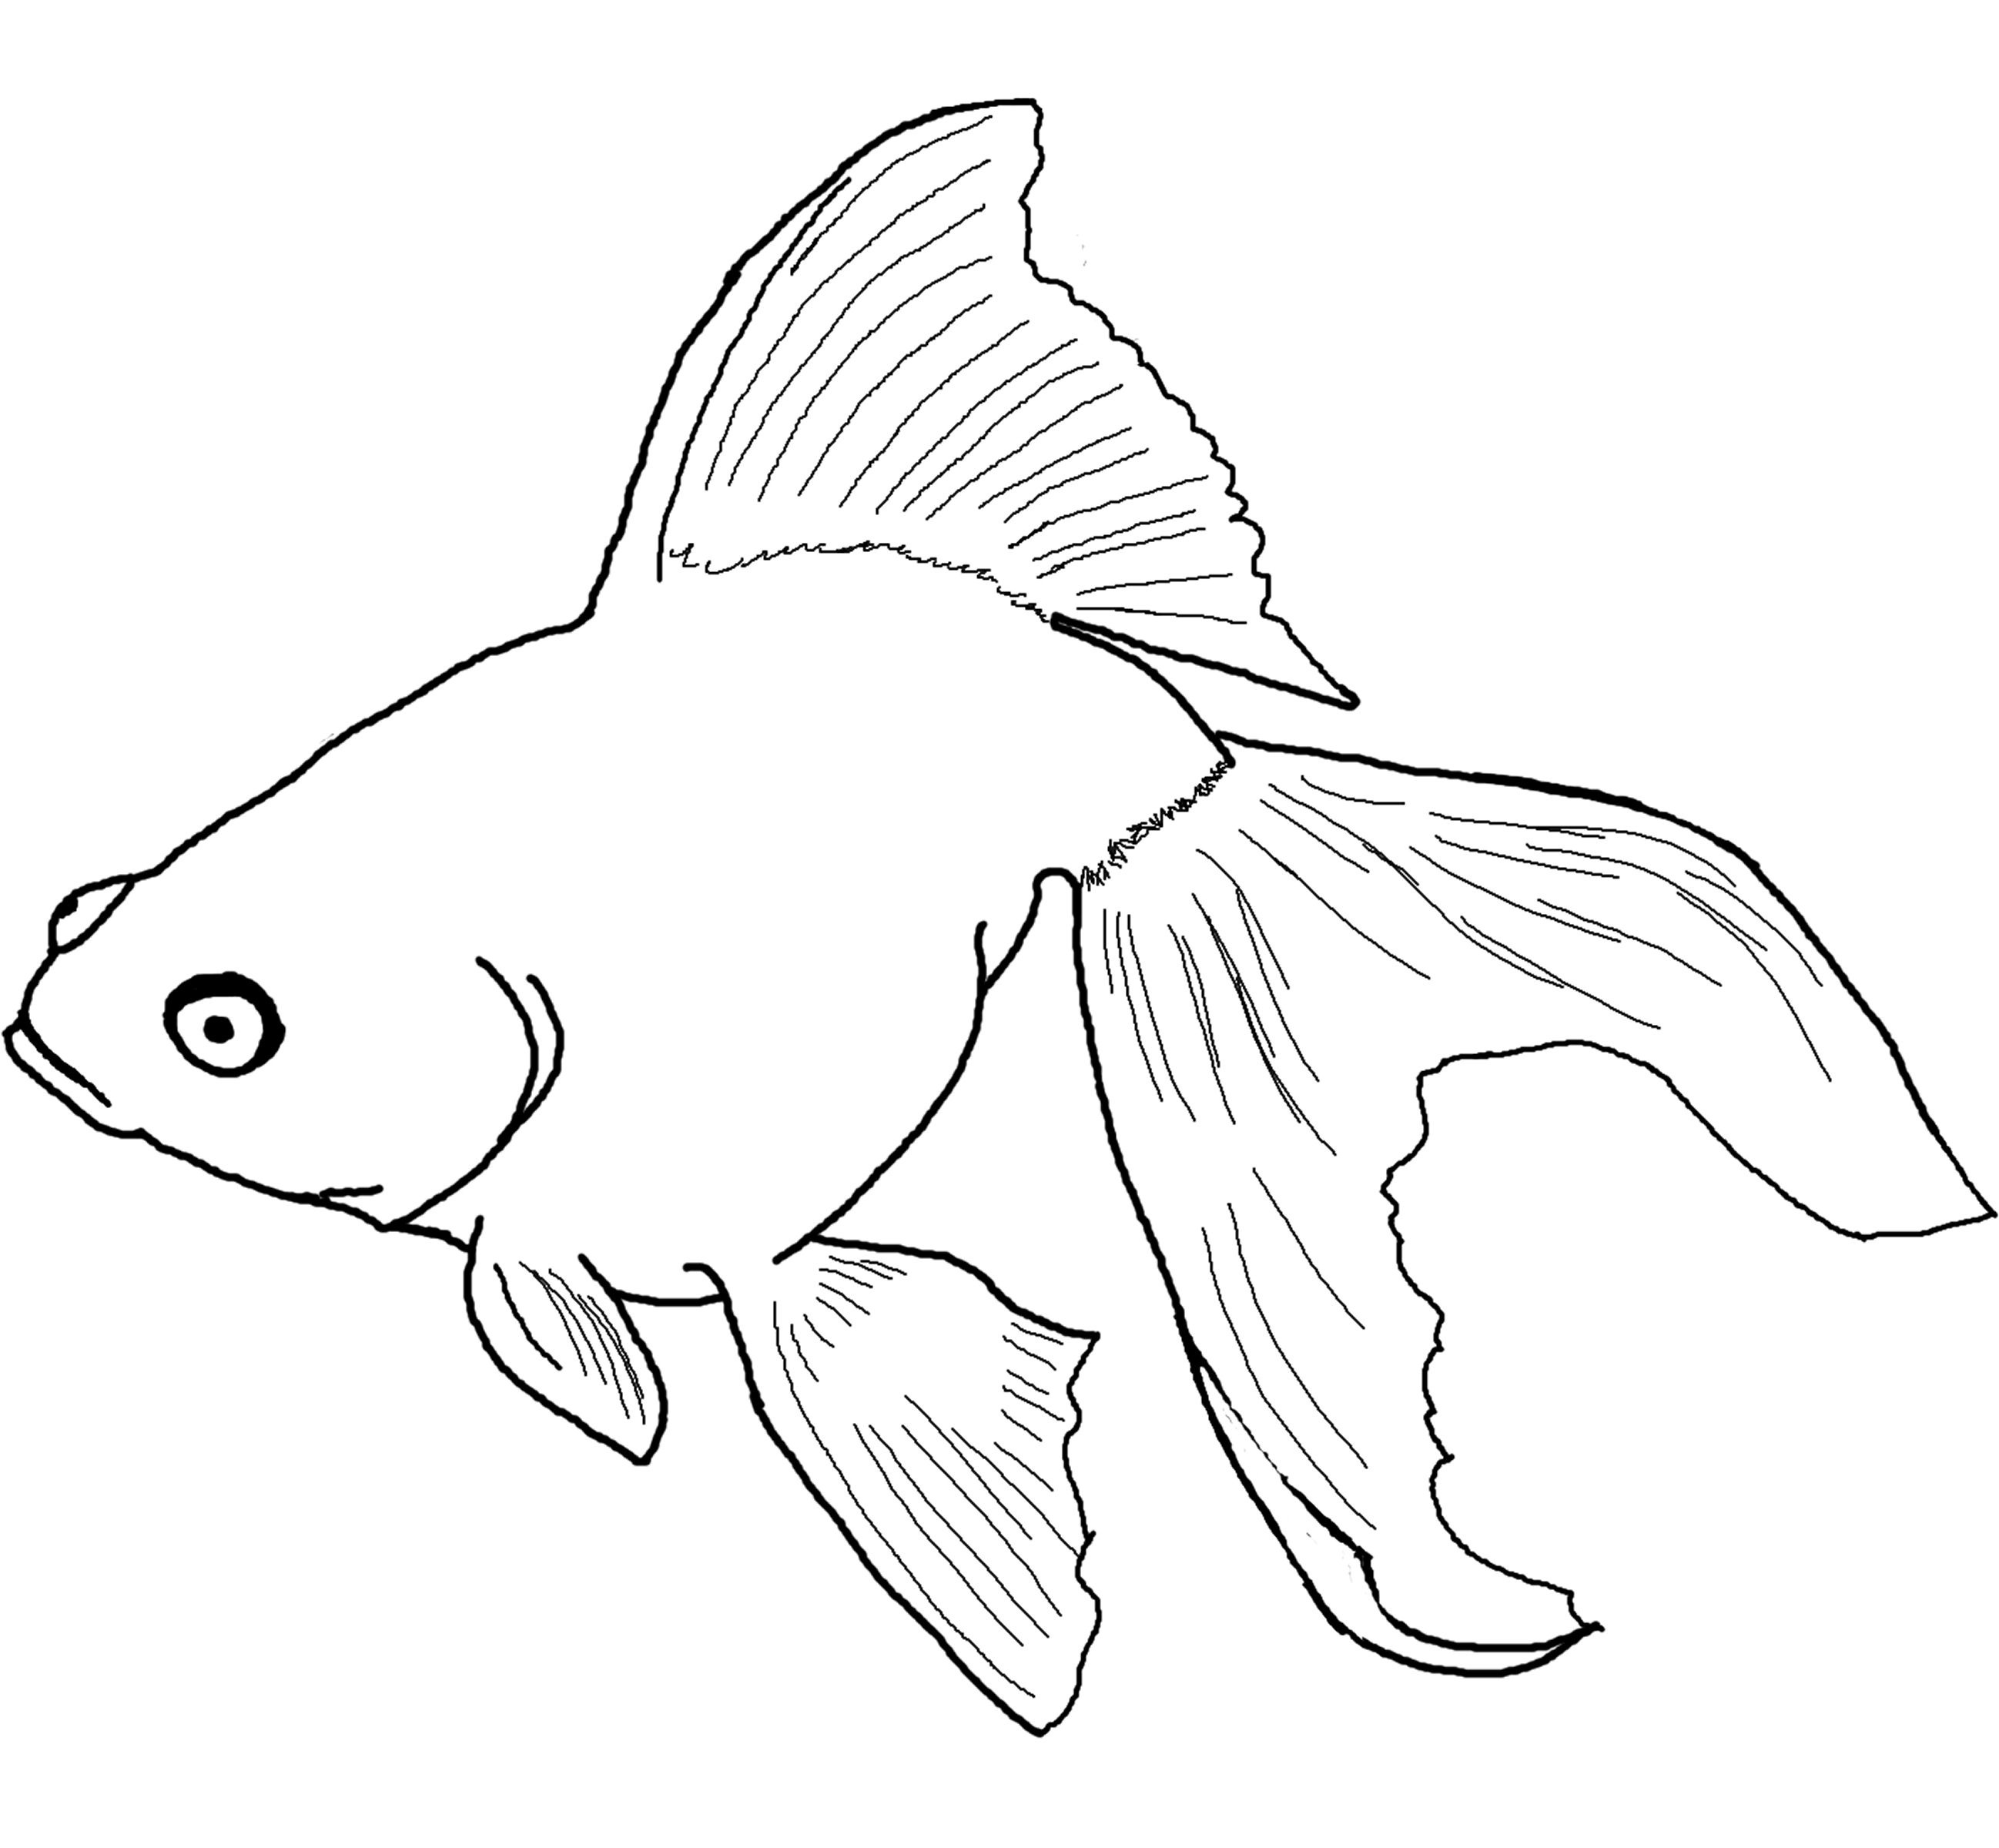 Drawn goldfish small fish Coloring Angelfish coloring drawings Download